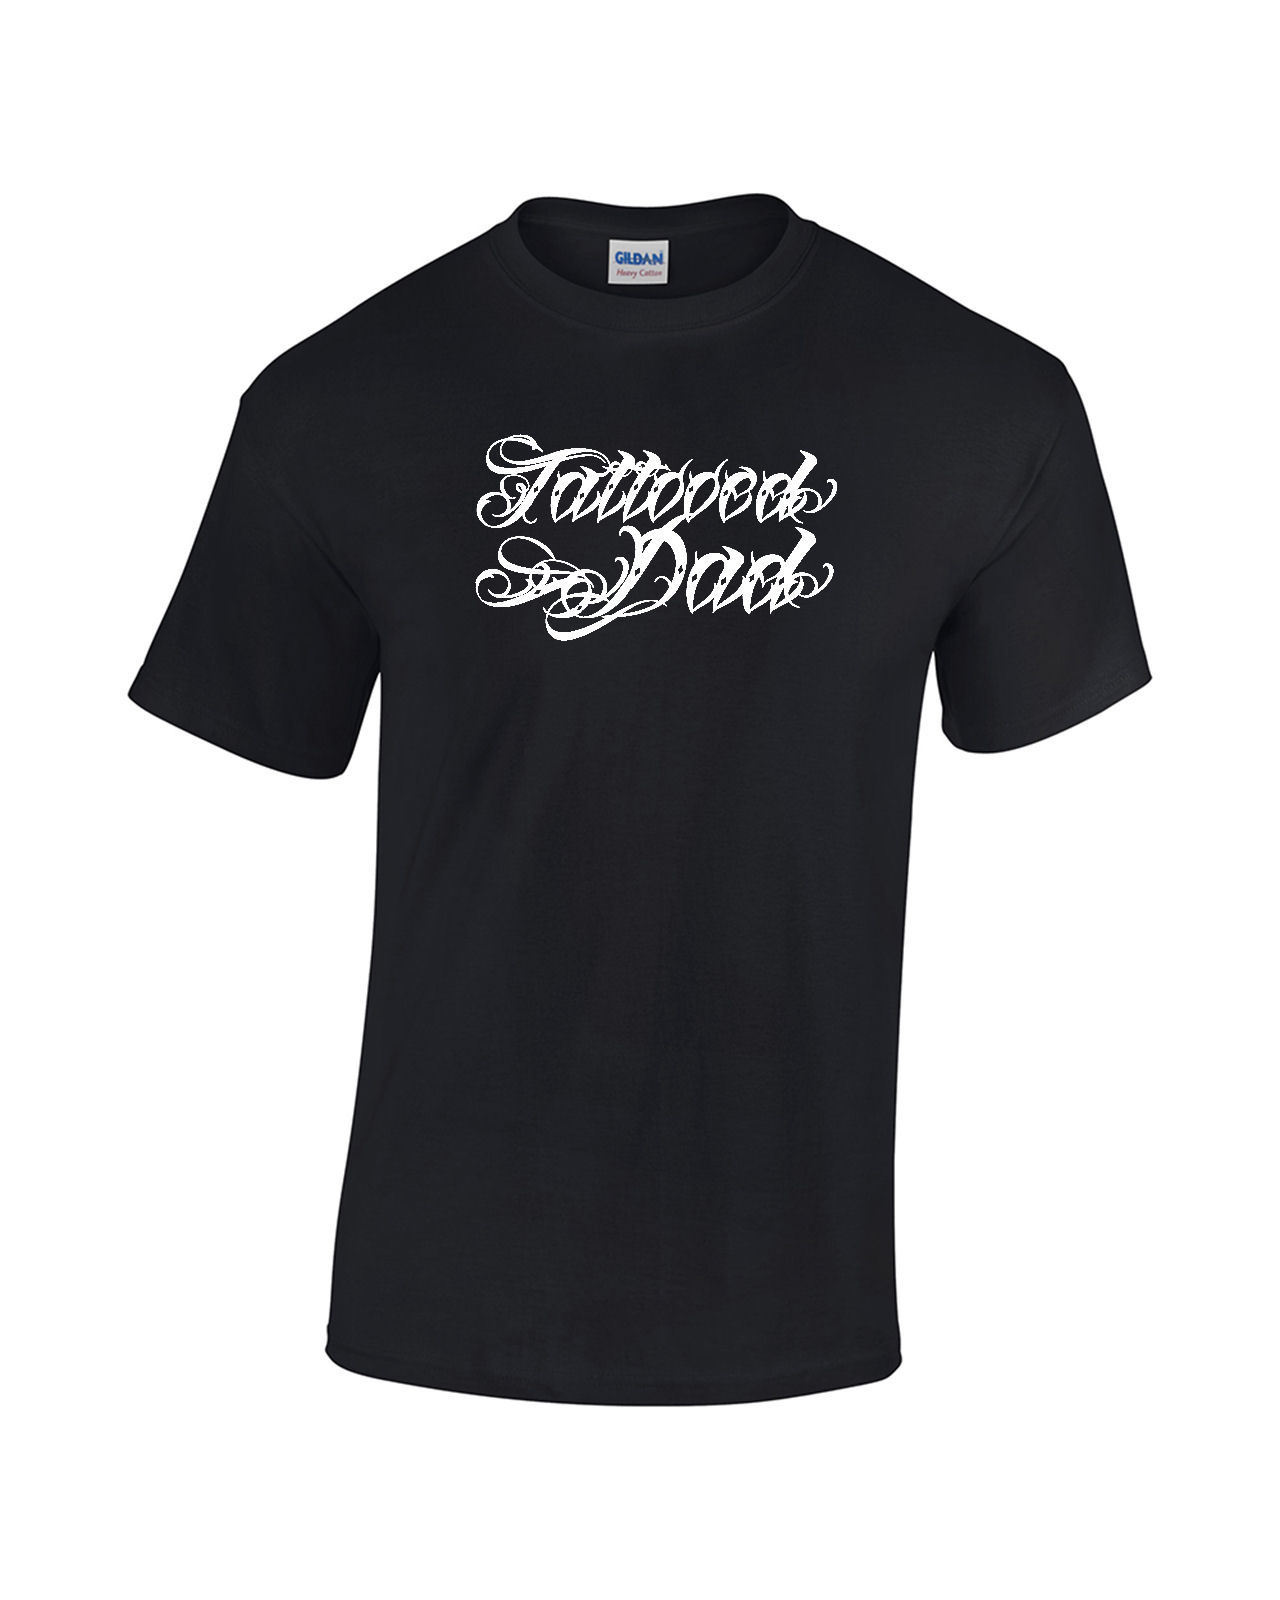 TATTOOED DAD T-shirt Fathers Day Tattoo Ink Flash Mens Ladies Tee Men Print Cotton O Neck Shirts